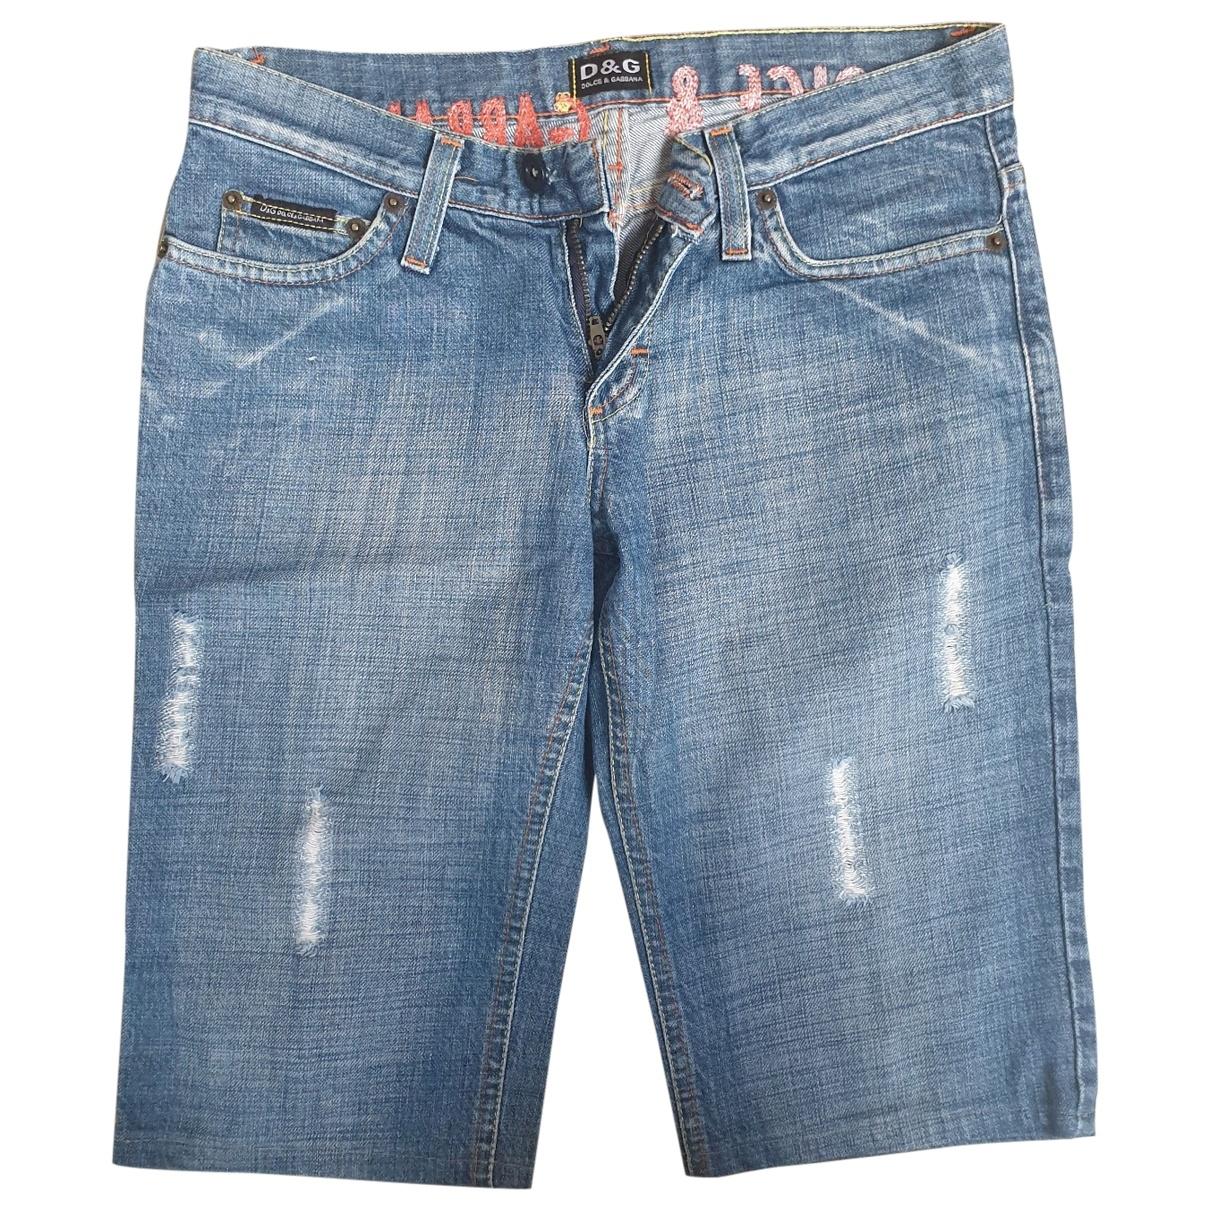 D&g \N Shorts in  Blau Baumwolle